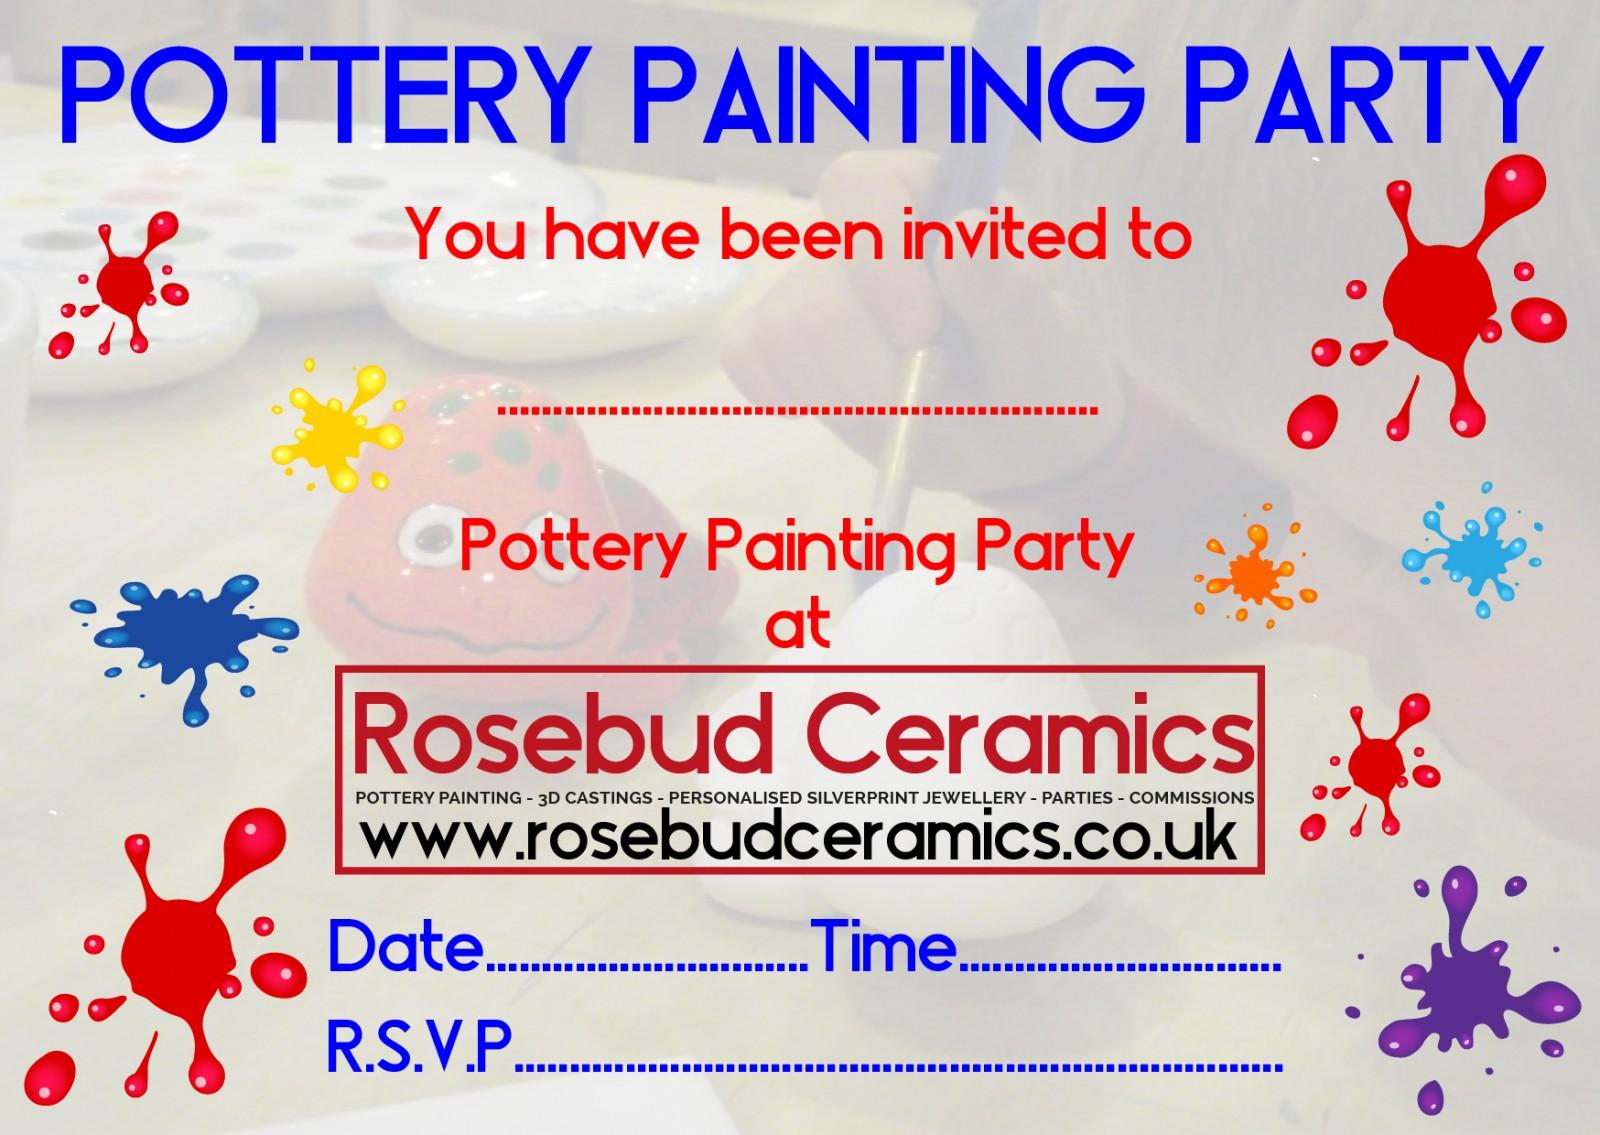 Party Invitations Rosebud Ceramics – Pottery Painting Party Invitations